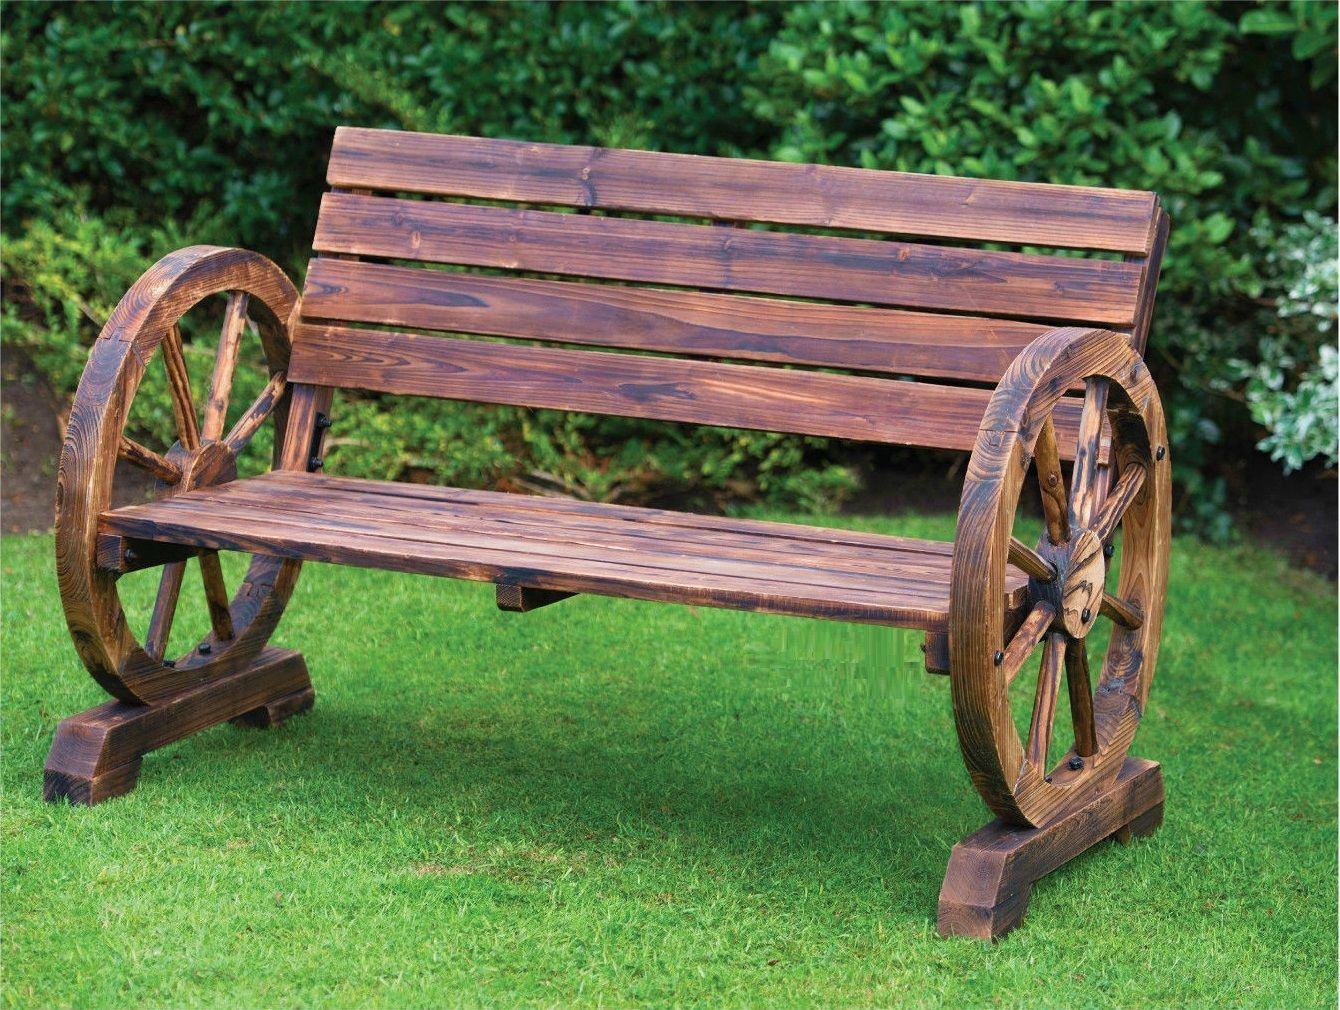 Banco de jardim de madeira vintage